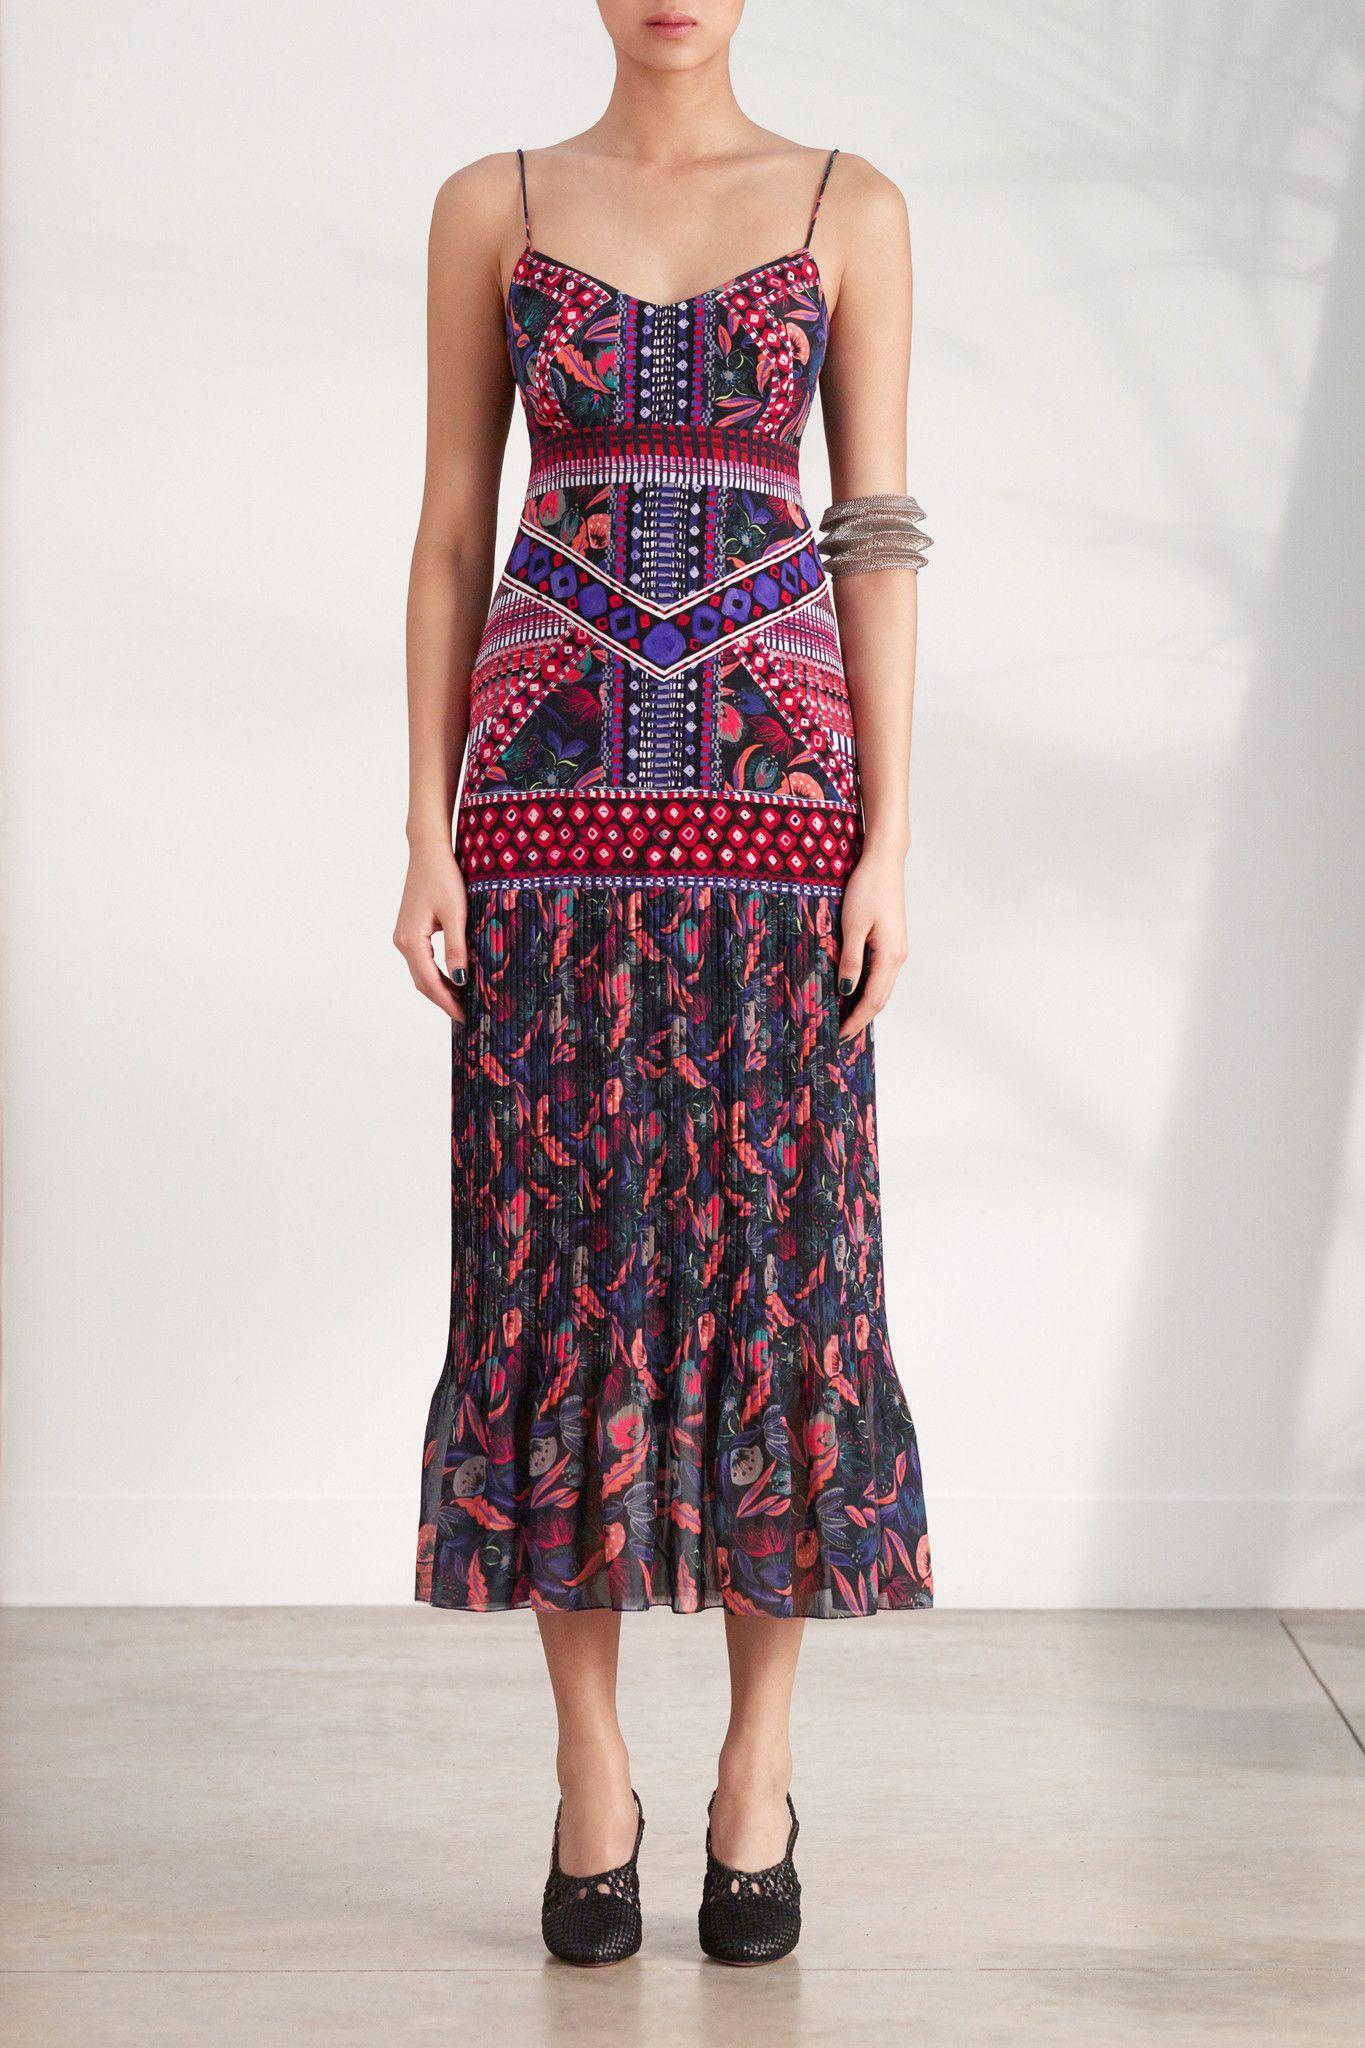 Veronica Bandhani Midi Dress